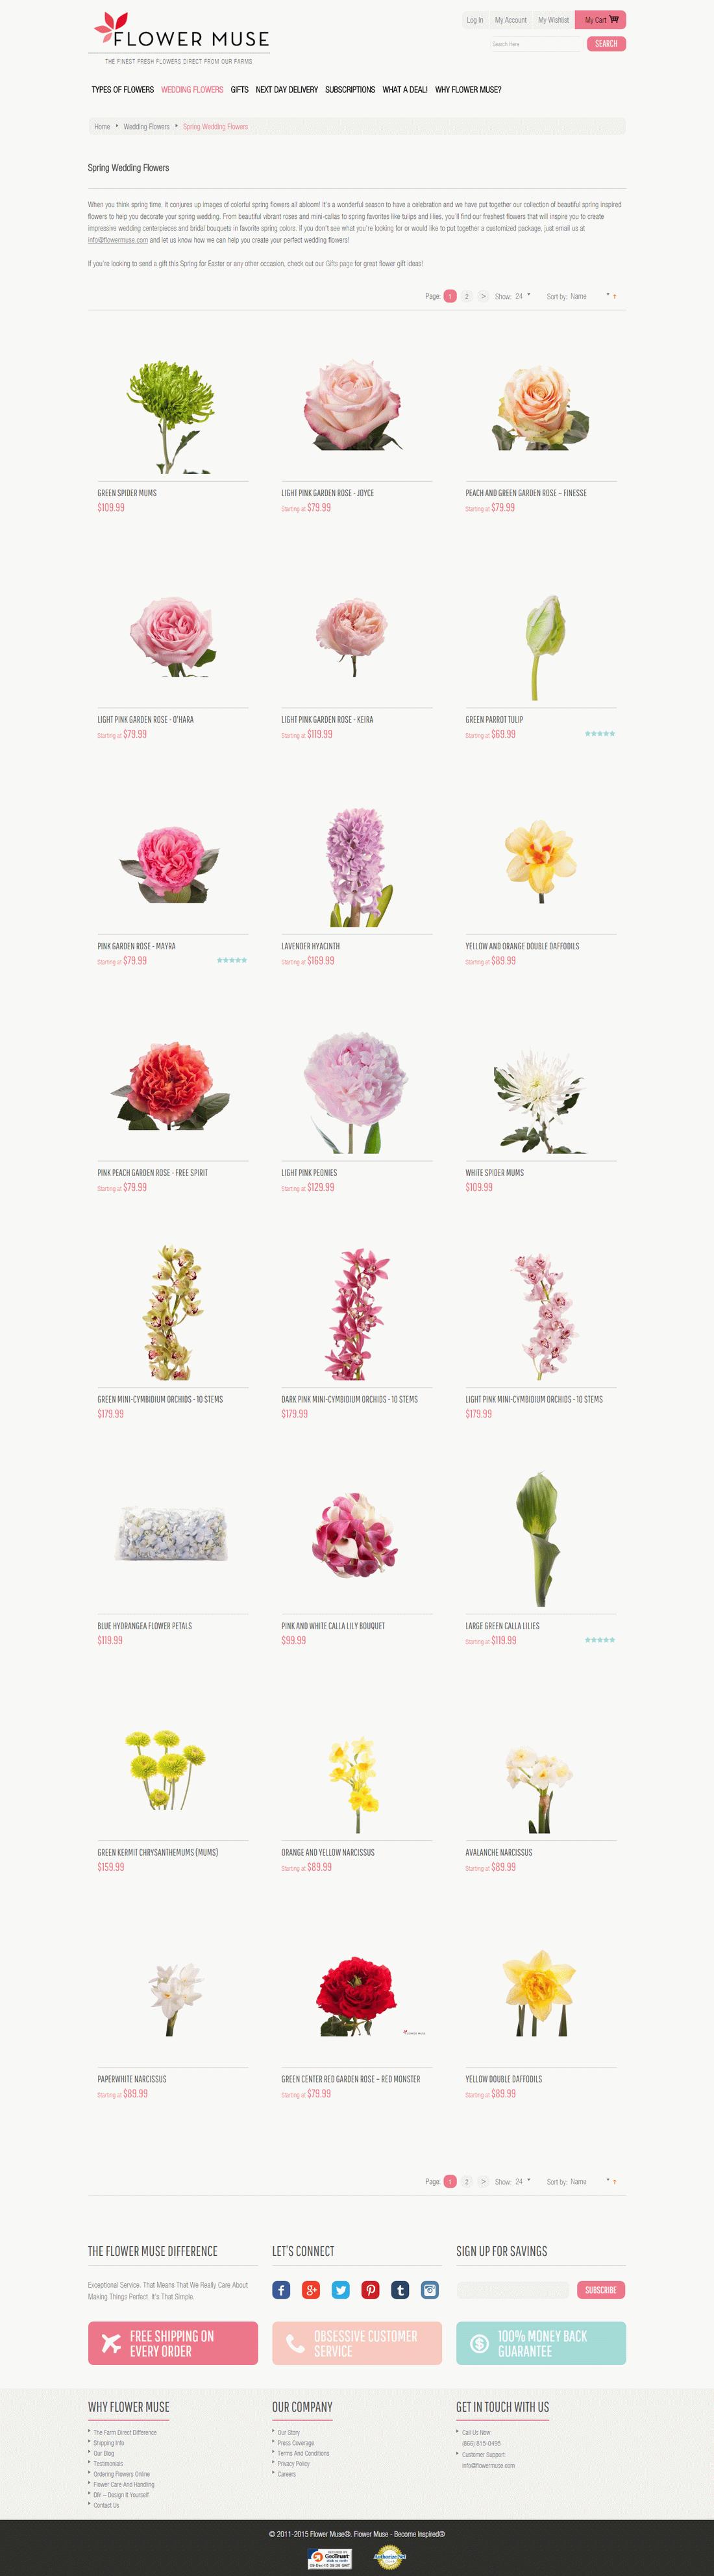 Flower Muse-2